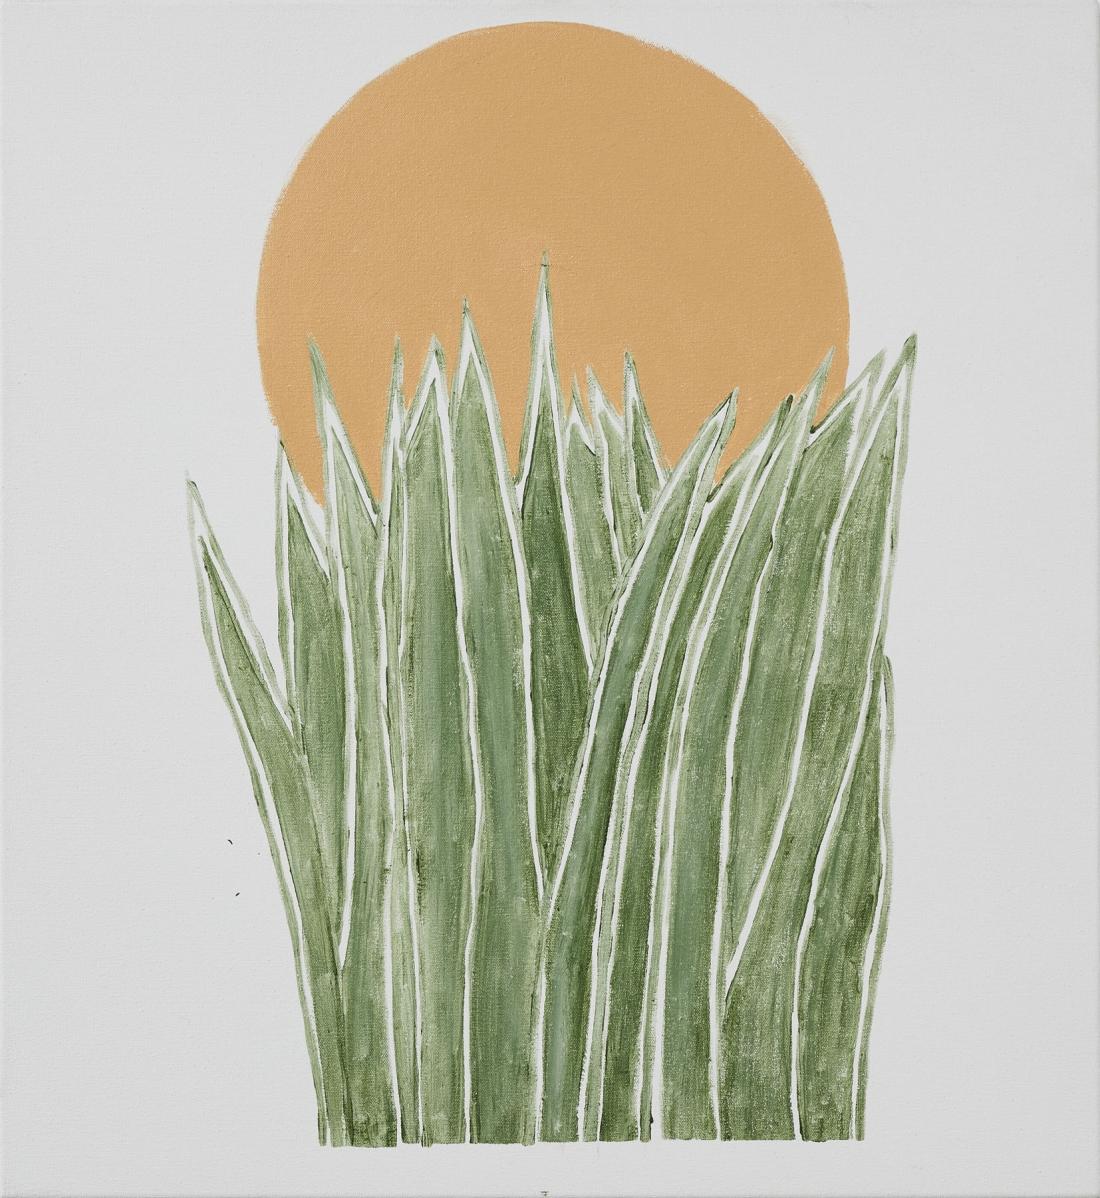 Harvest Moon © Gareth Kemp